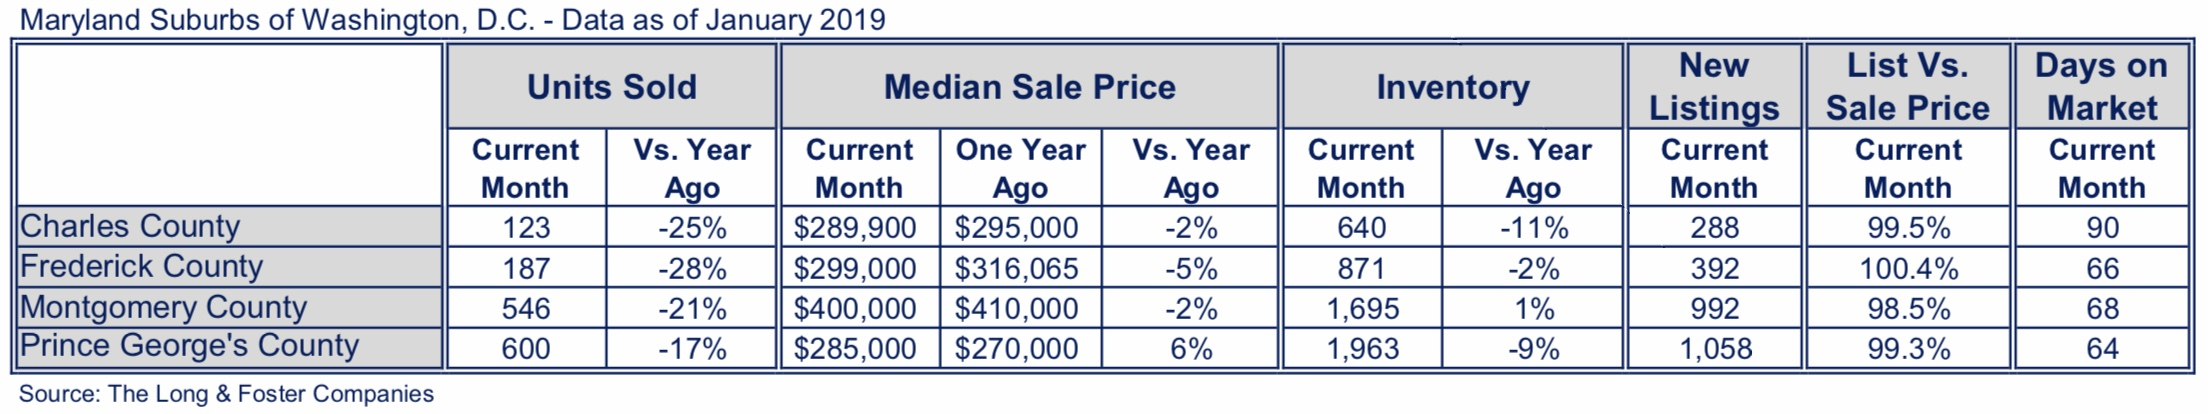 Maryland Suburbs Market Minute Chart Jan 2019